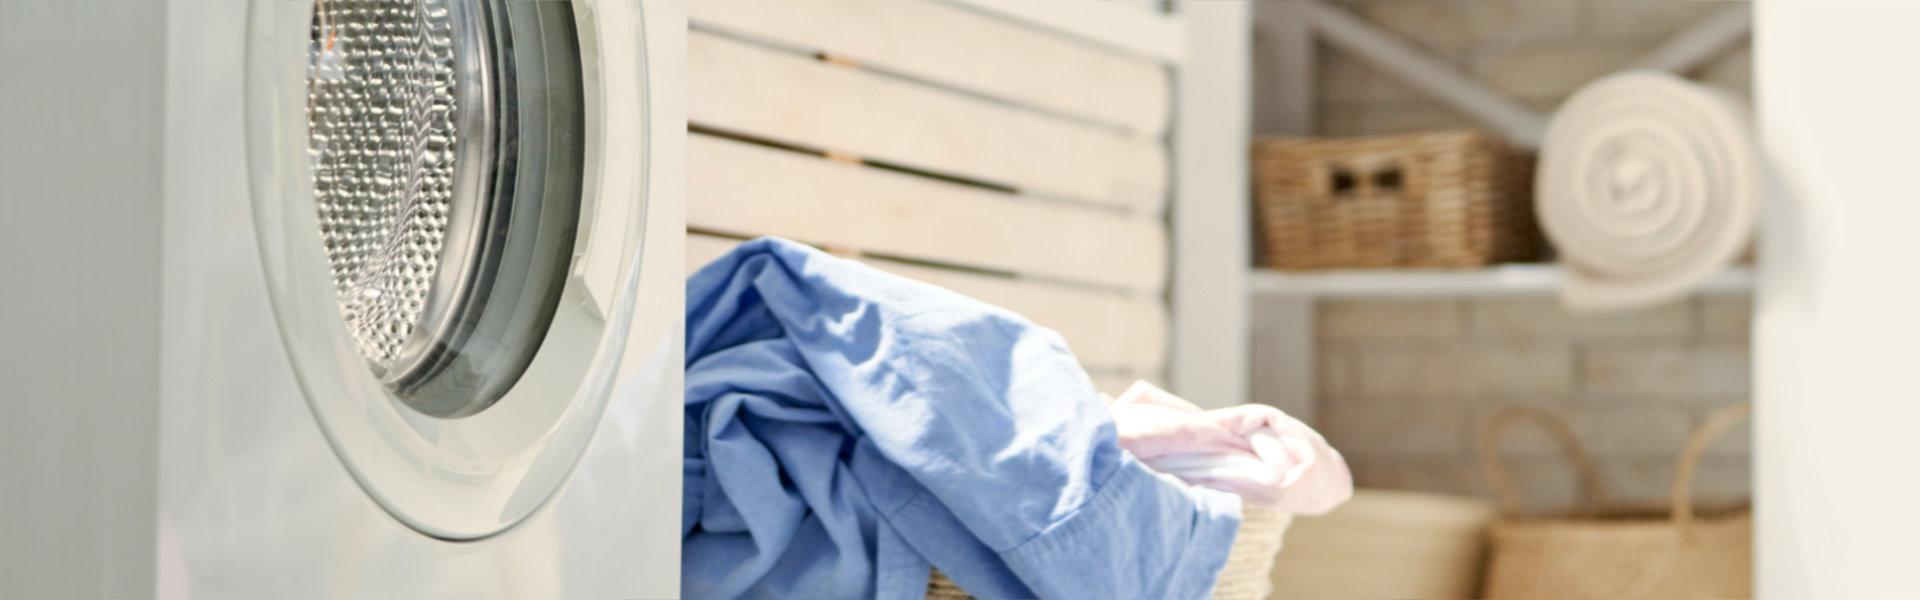 Perilica rublja - prednost inverterskog motora